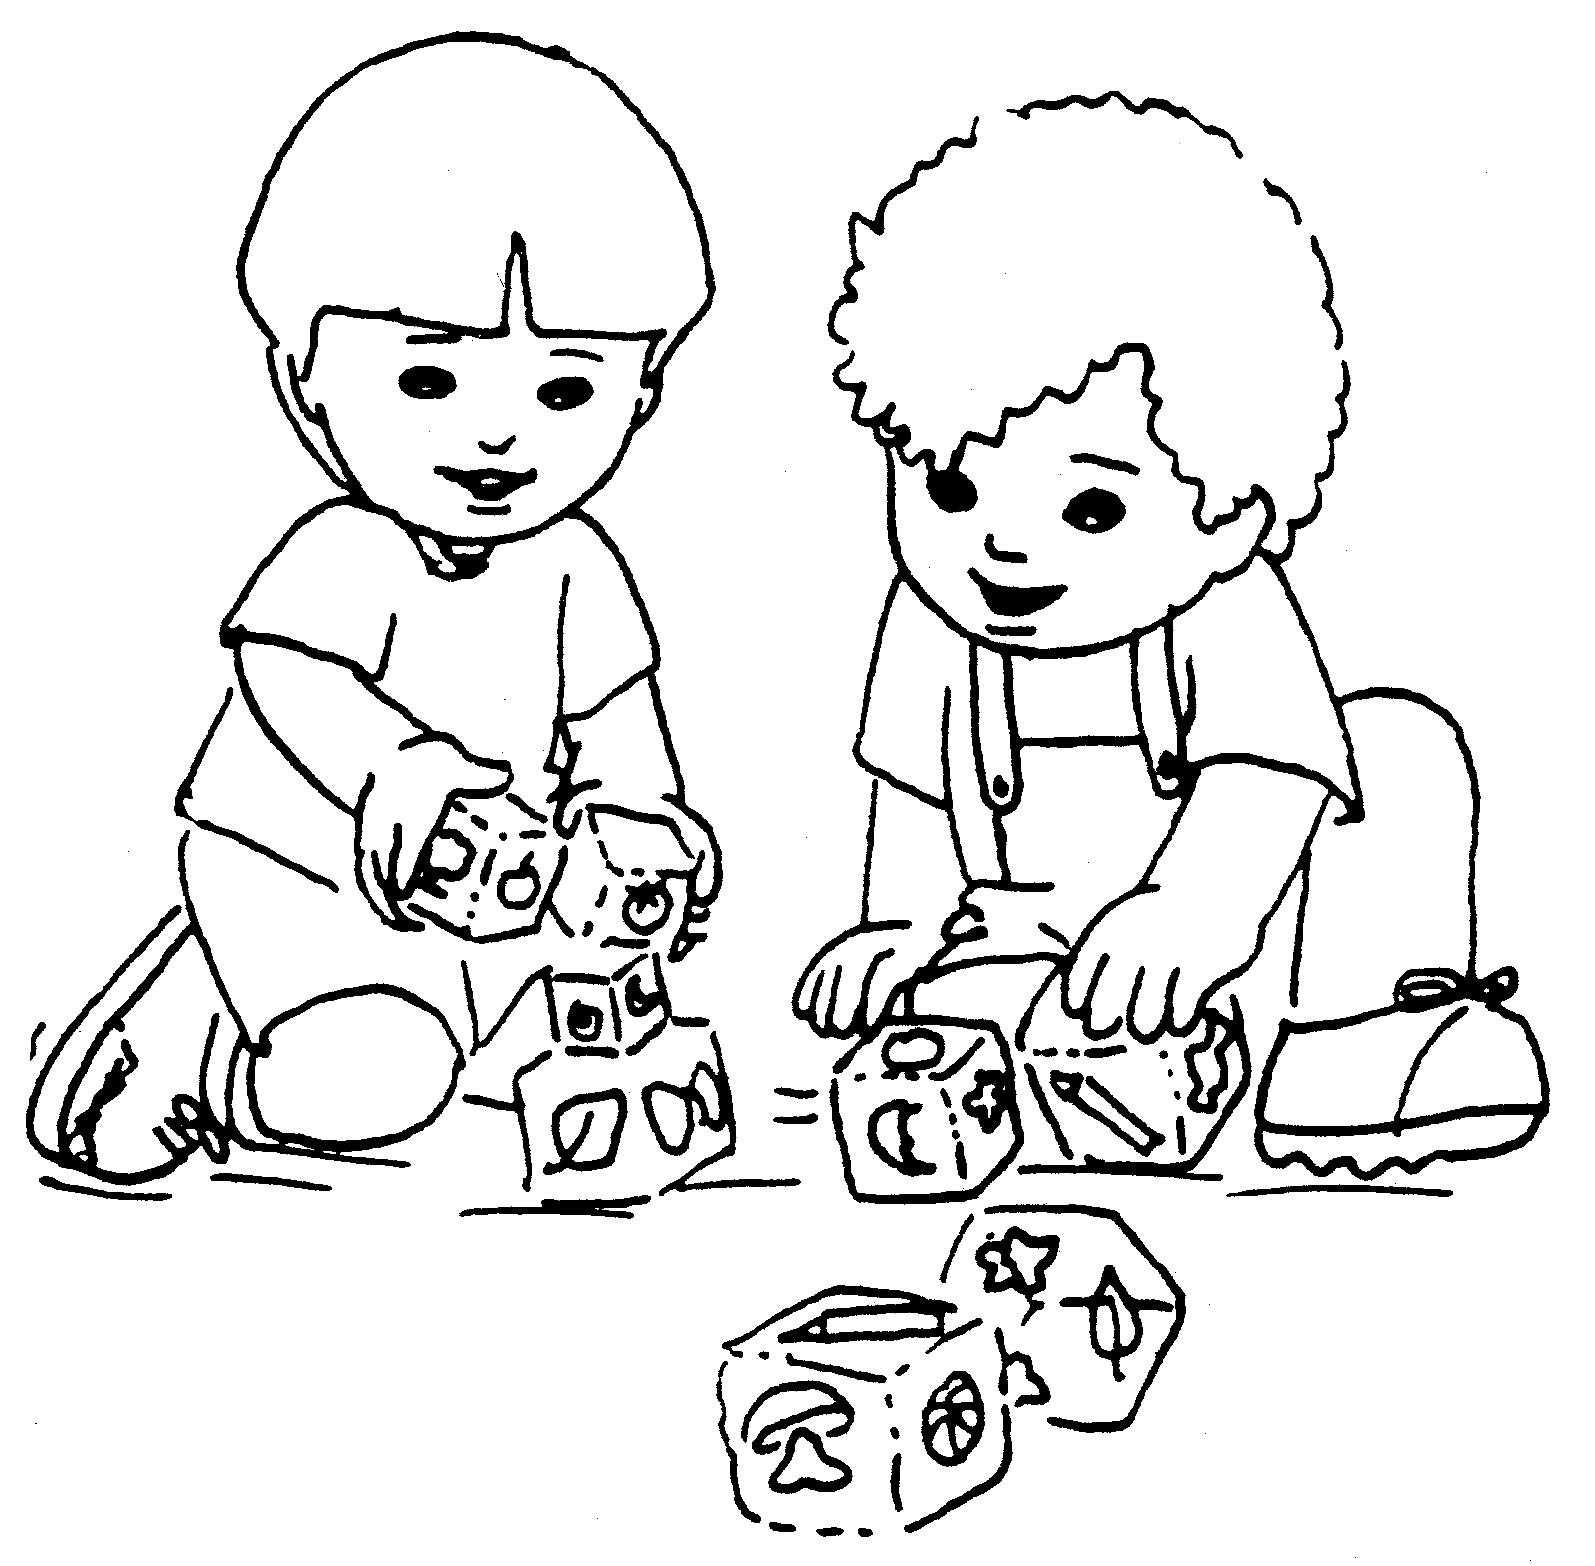 Escola Dominical Infantil: Atividade para colorir